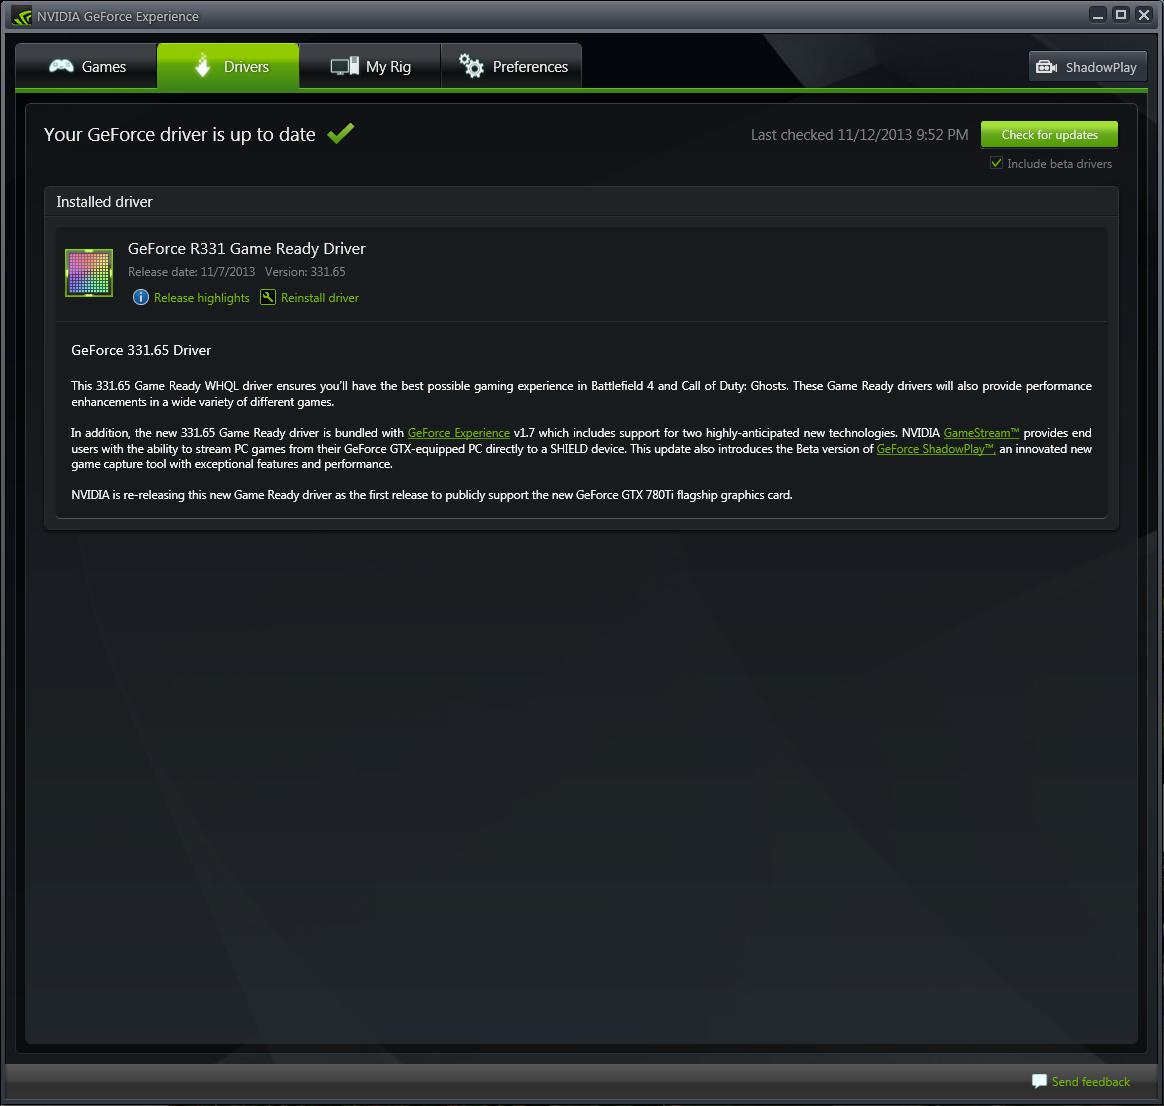 screenshot.Nvidia.GeForce.Experience 2 نرم افزار بهینه سازی بازی ها Nvidia GeForce Experience 2 0 0 0